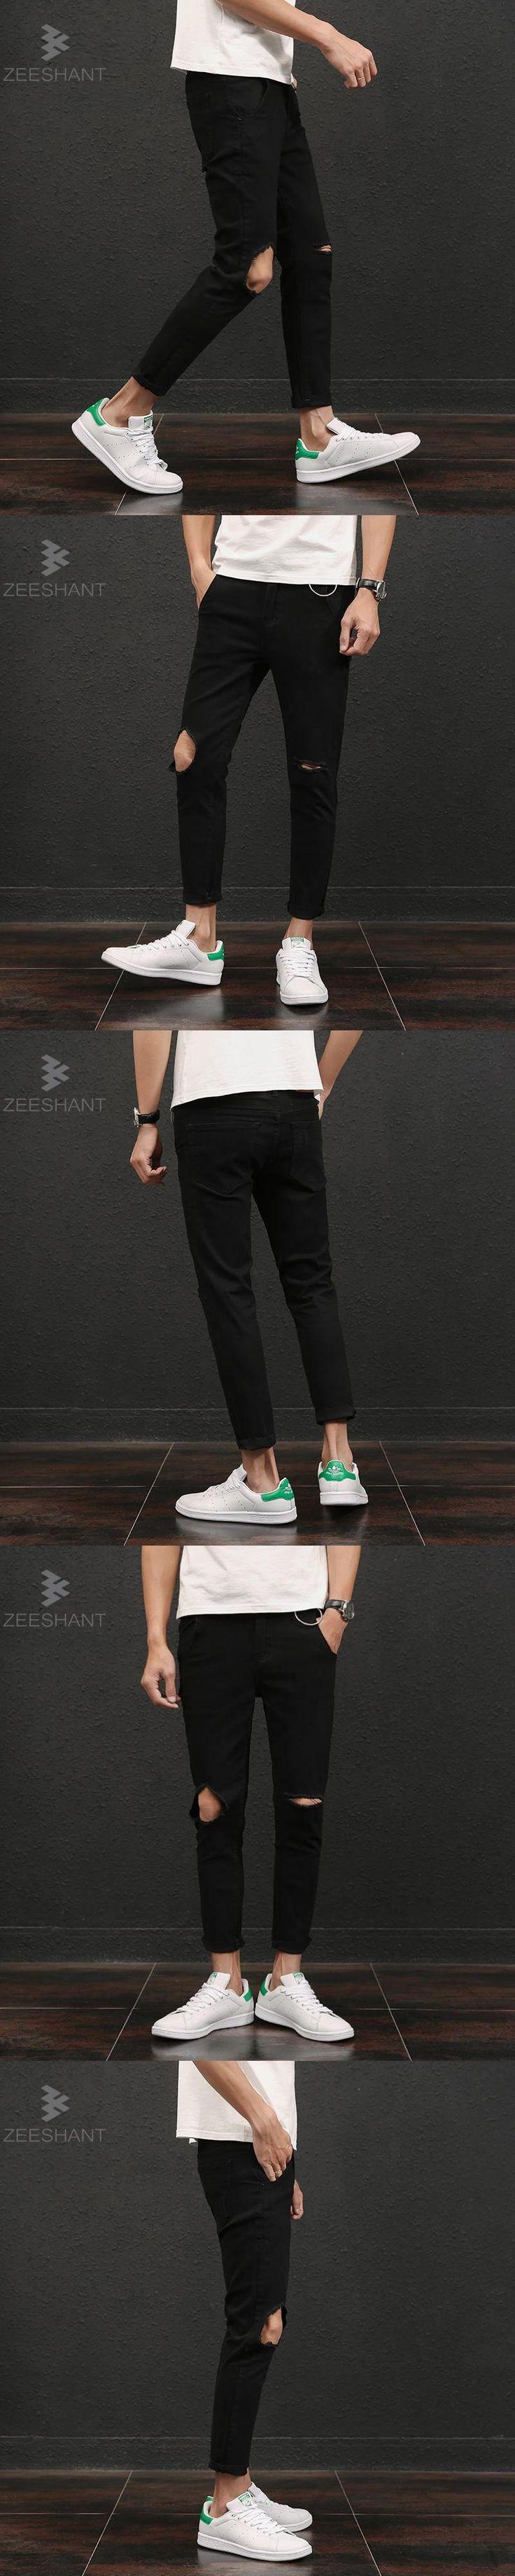 Streetwear Pants 2017 Men's Jeans Ripped Jeans For Men Skinny Distressed Slim Famous Brand Designer Biker Hip Hop Swag Black